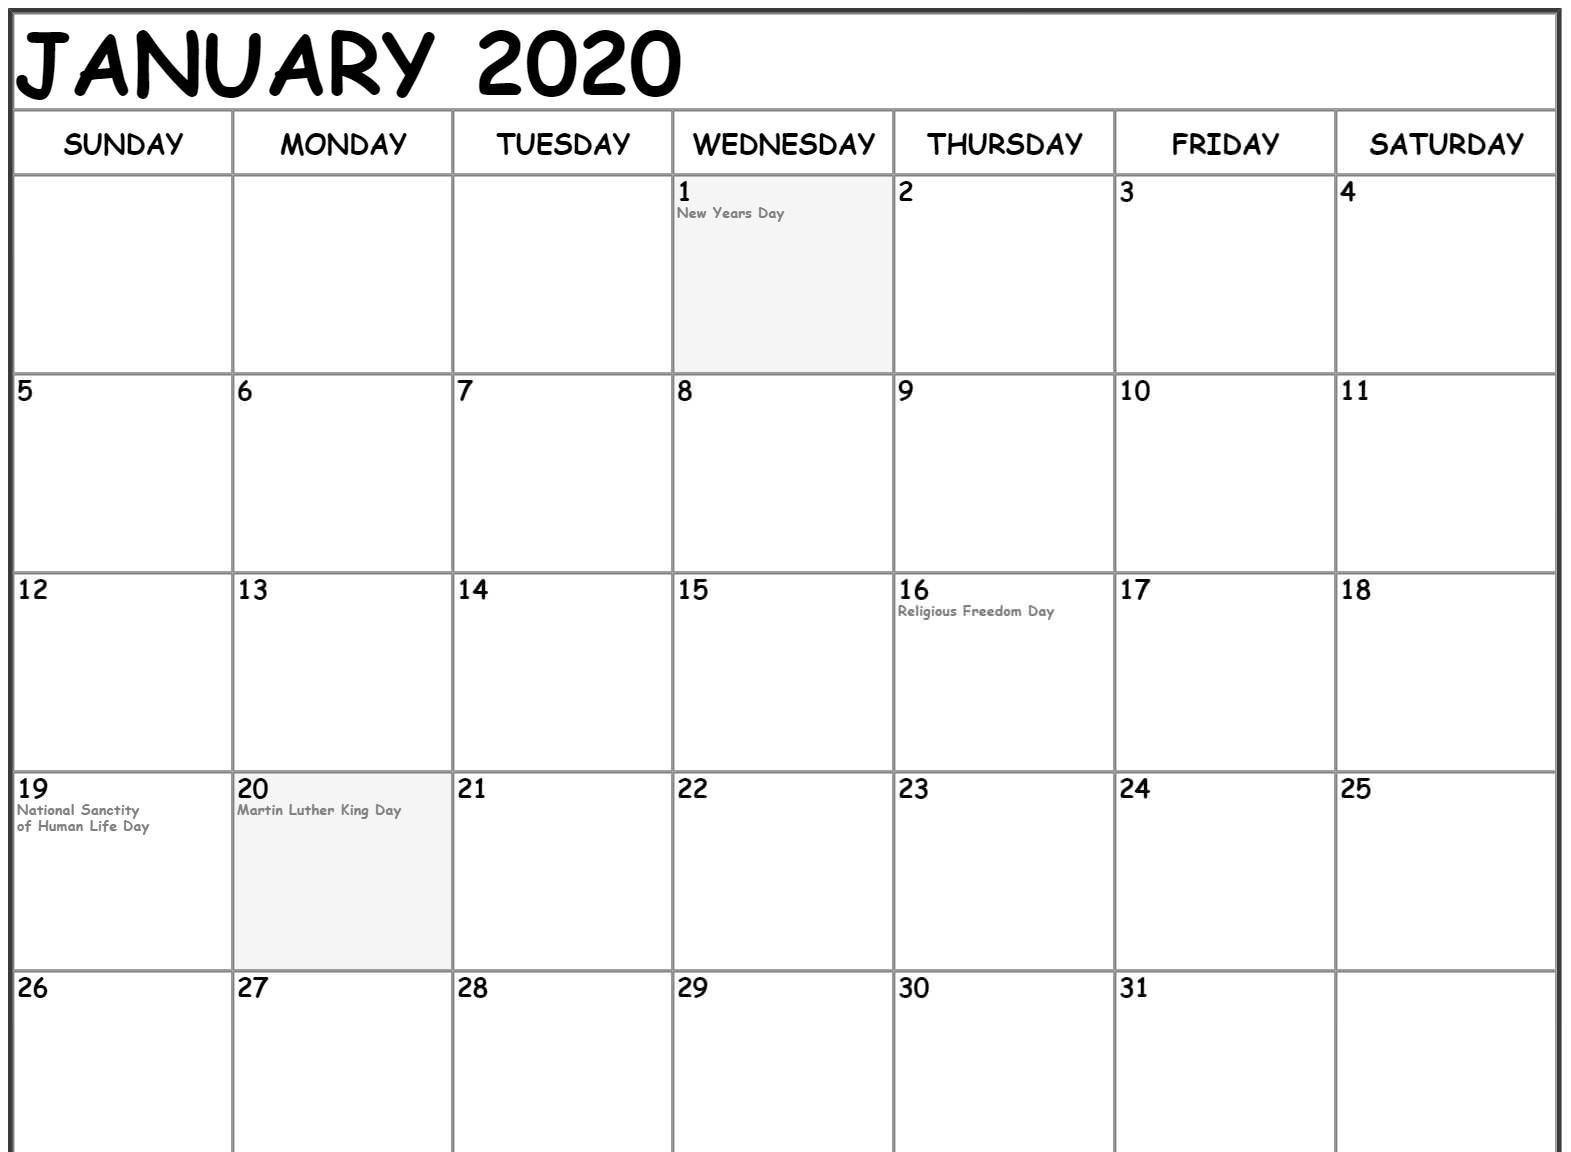 Effective 1117 Calendar Template | Get Your Calendar 30 Day Plank Challenge Printable In Word